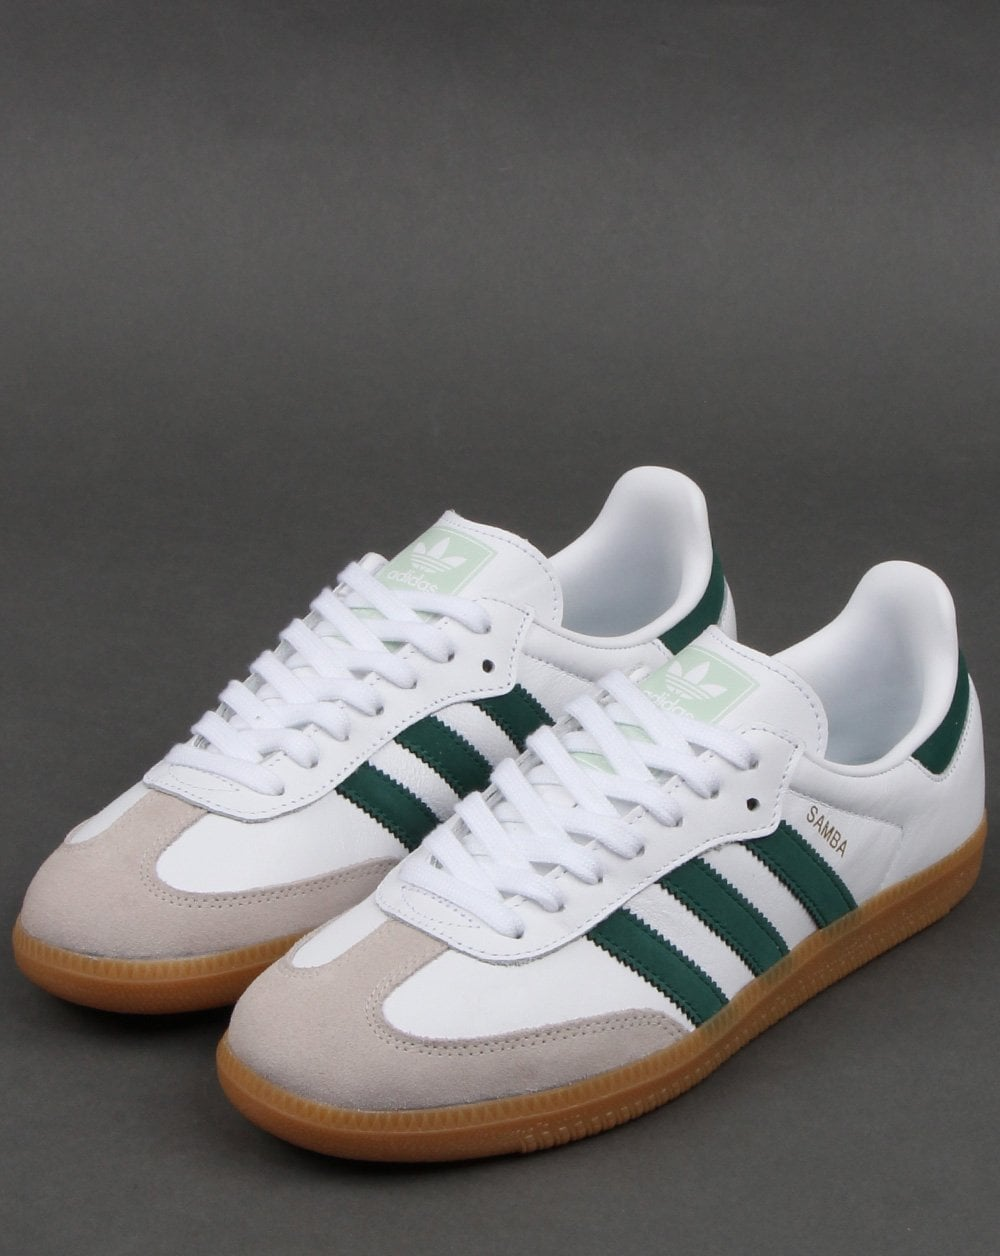 adidas Samba OG white green